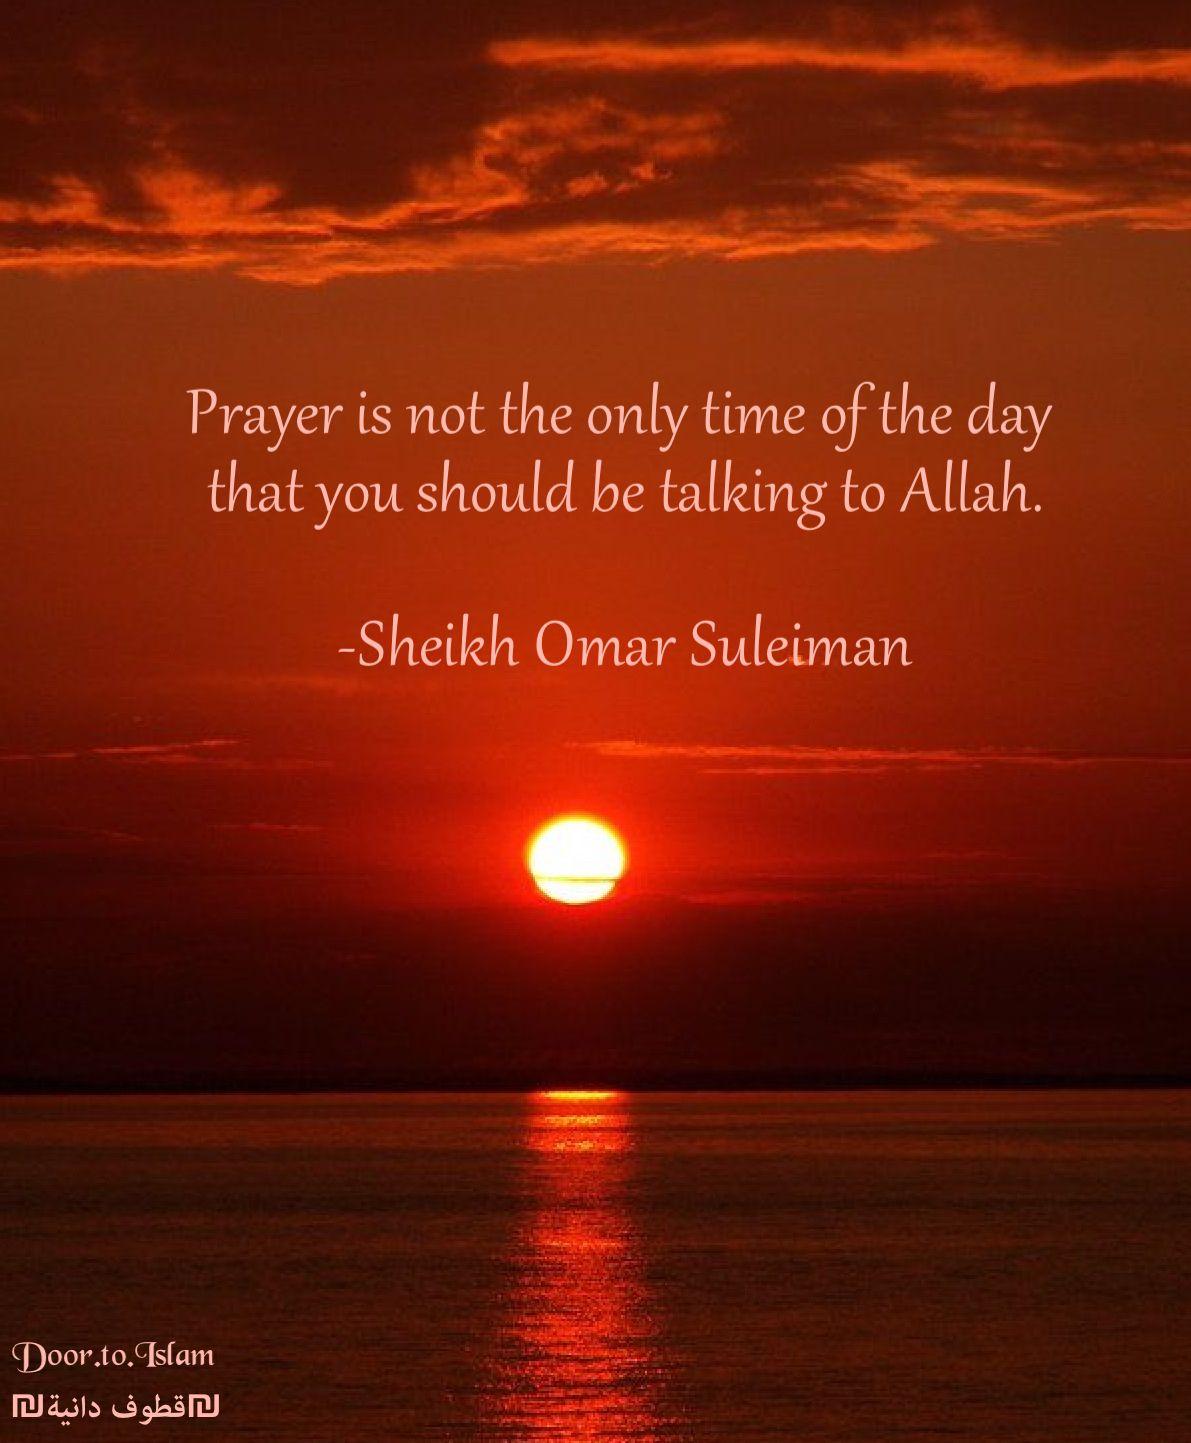 Best Islamic Quotes From Quran: Allah Islam Quran Islamic Quotes Omar Suleiman